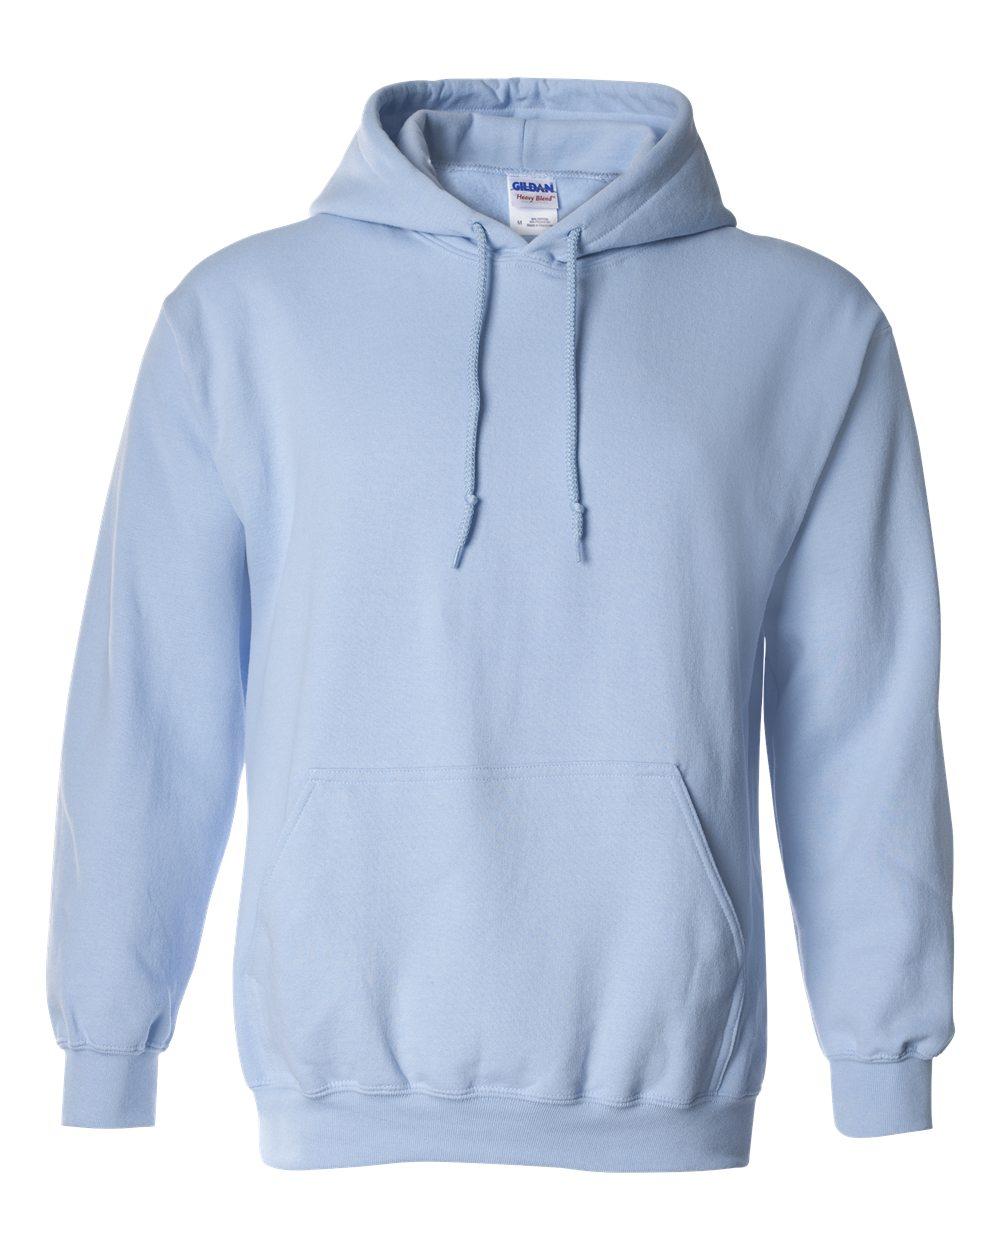 Gildan-Mens-Blank-Hoodie-Heavy-Blend-Hooded-Sweatshirt-Solid-18500-up-to-5XL thumbnail 50